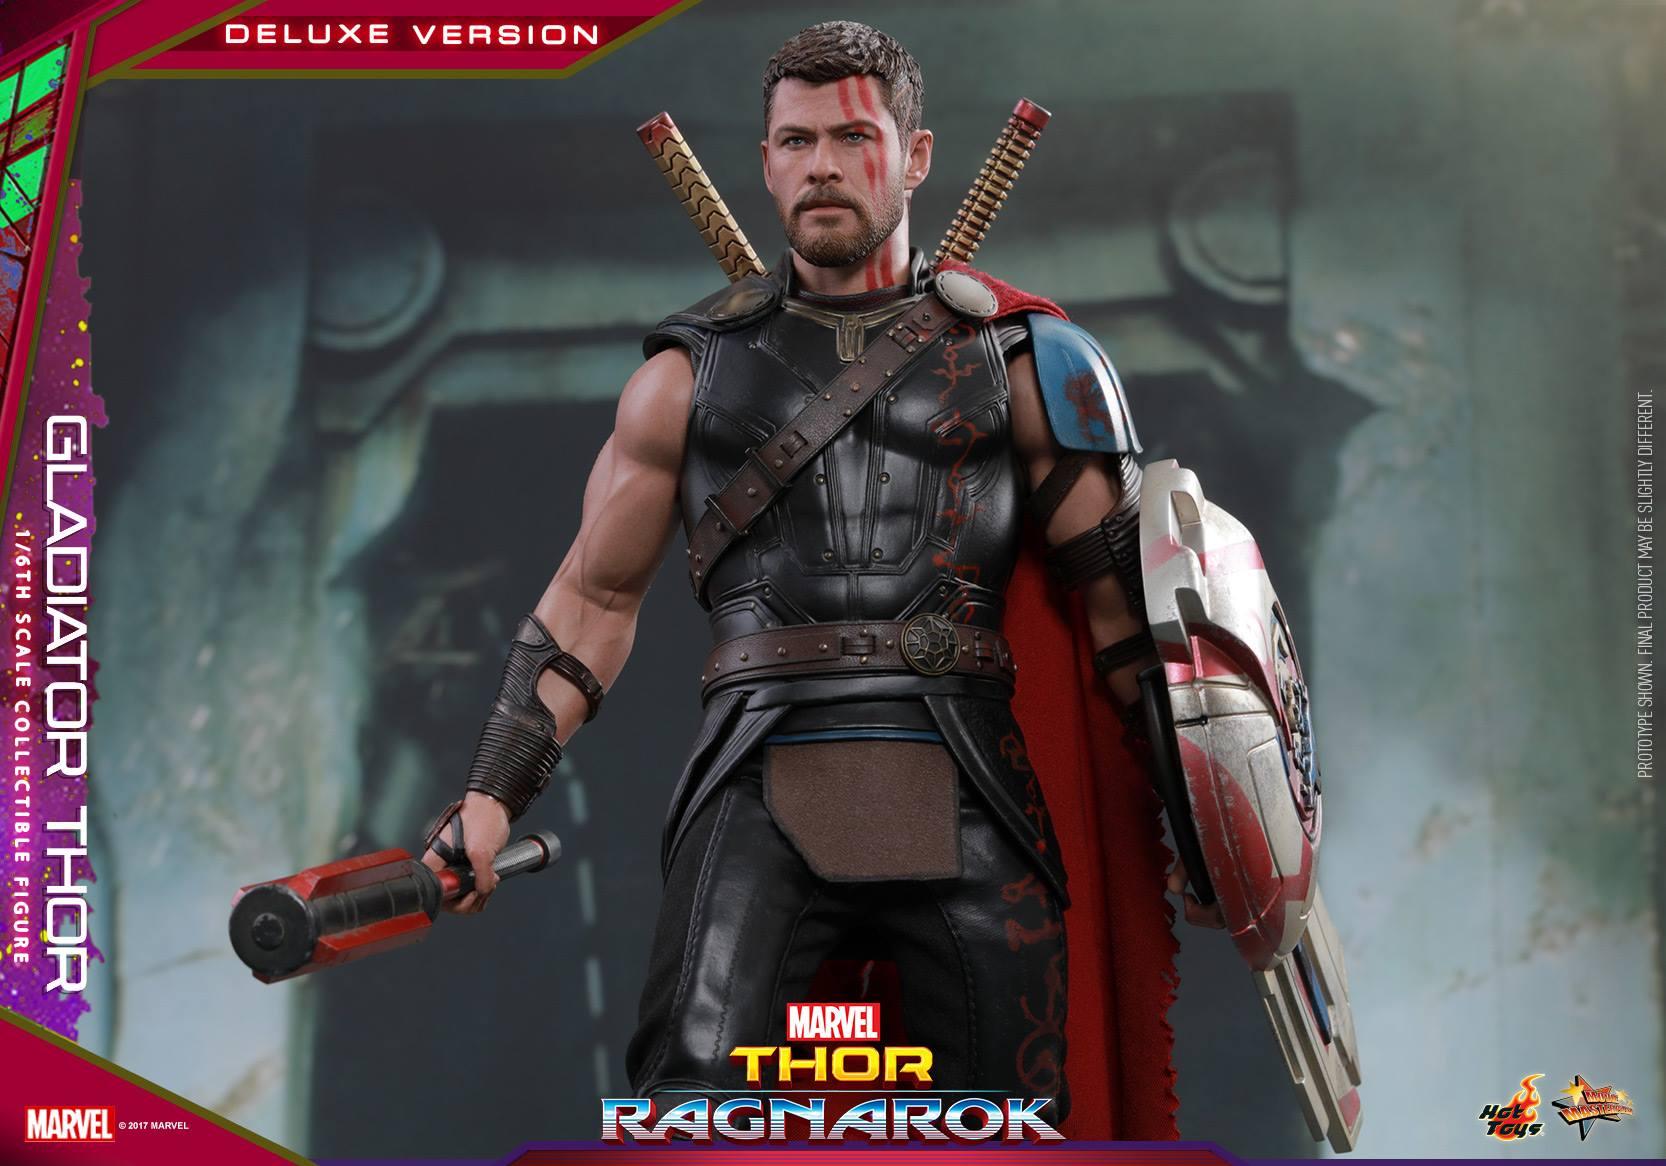 Link a Hot Toys Thor Ragnarok DeLuxe 18